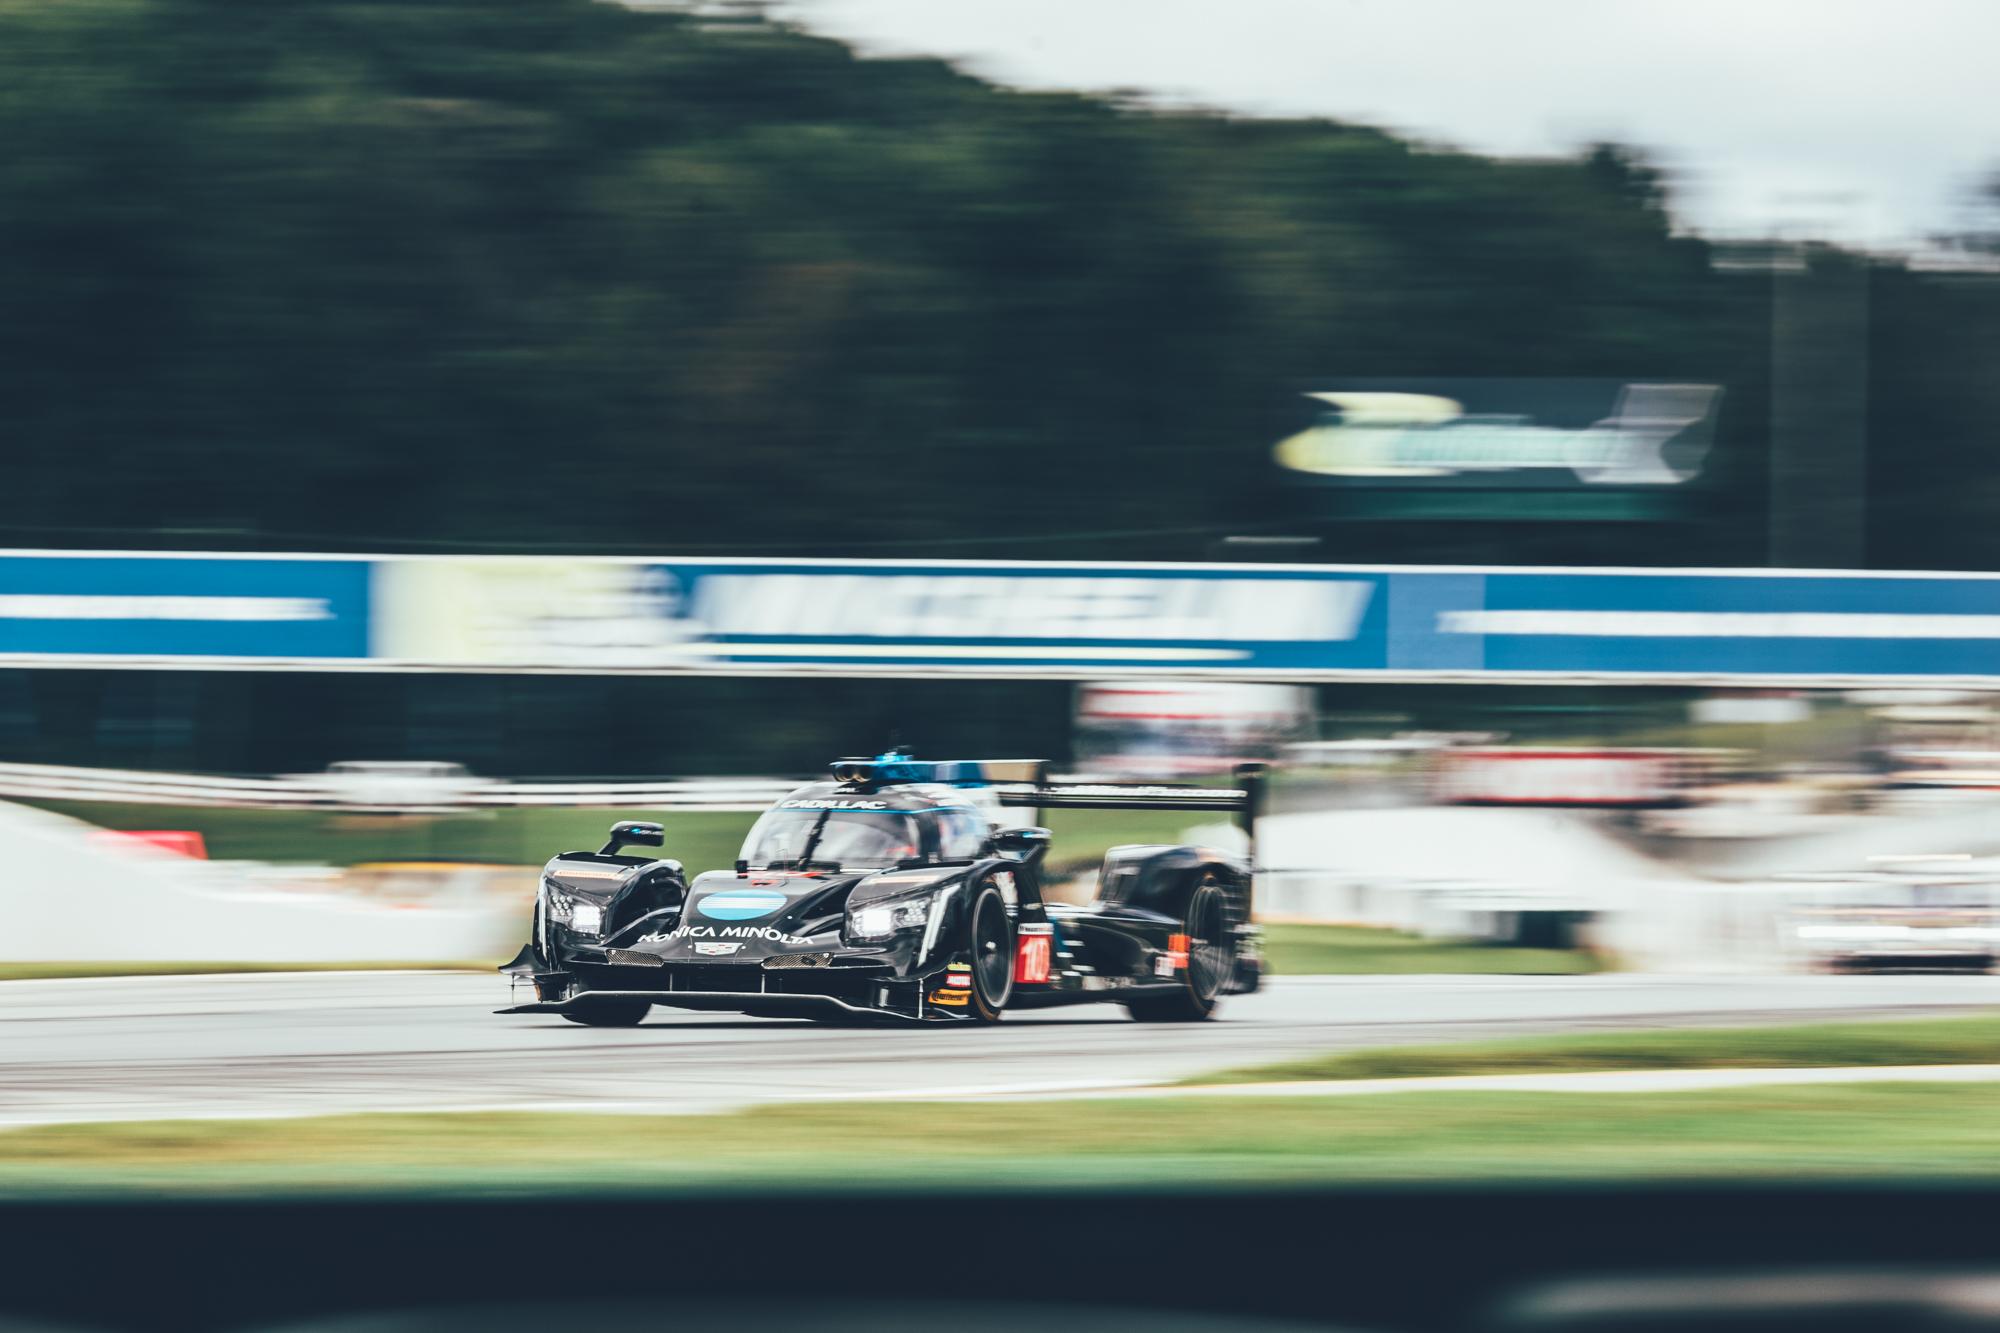 CADILLAC DPI V.R.: HOW TO BUILD A WINNING RACECAR